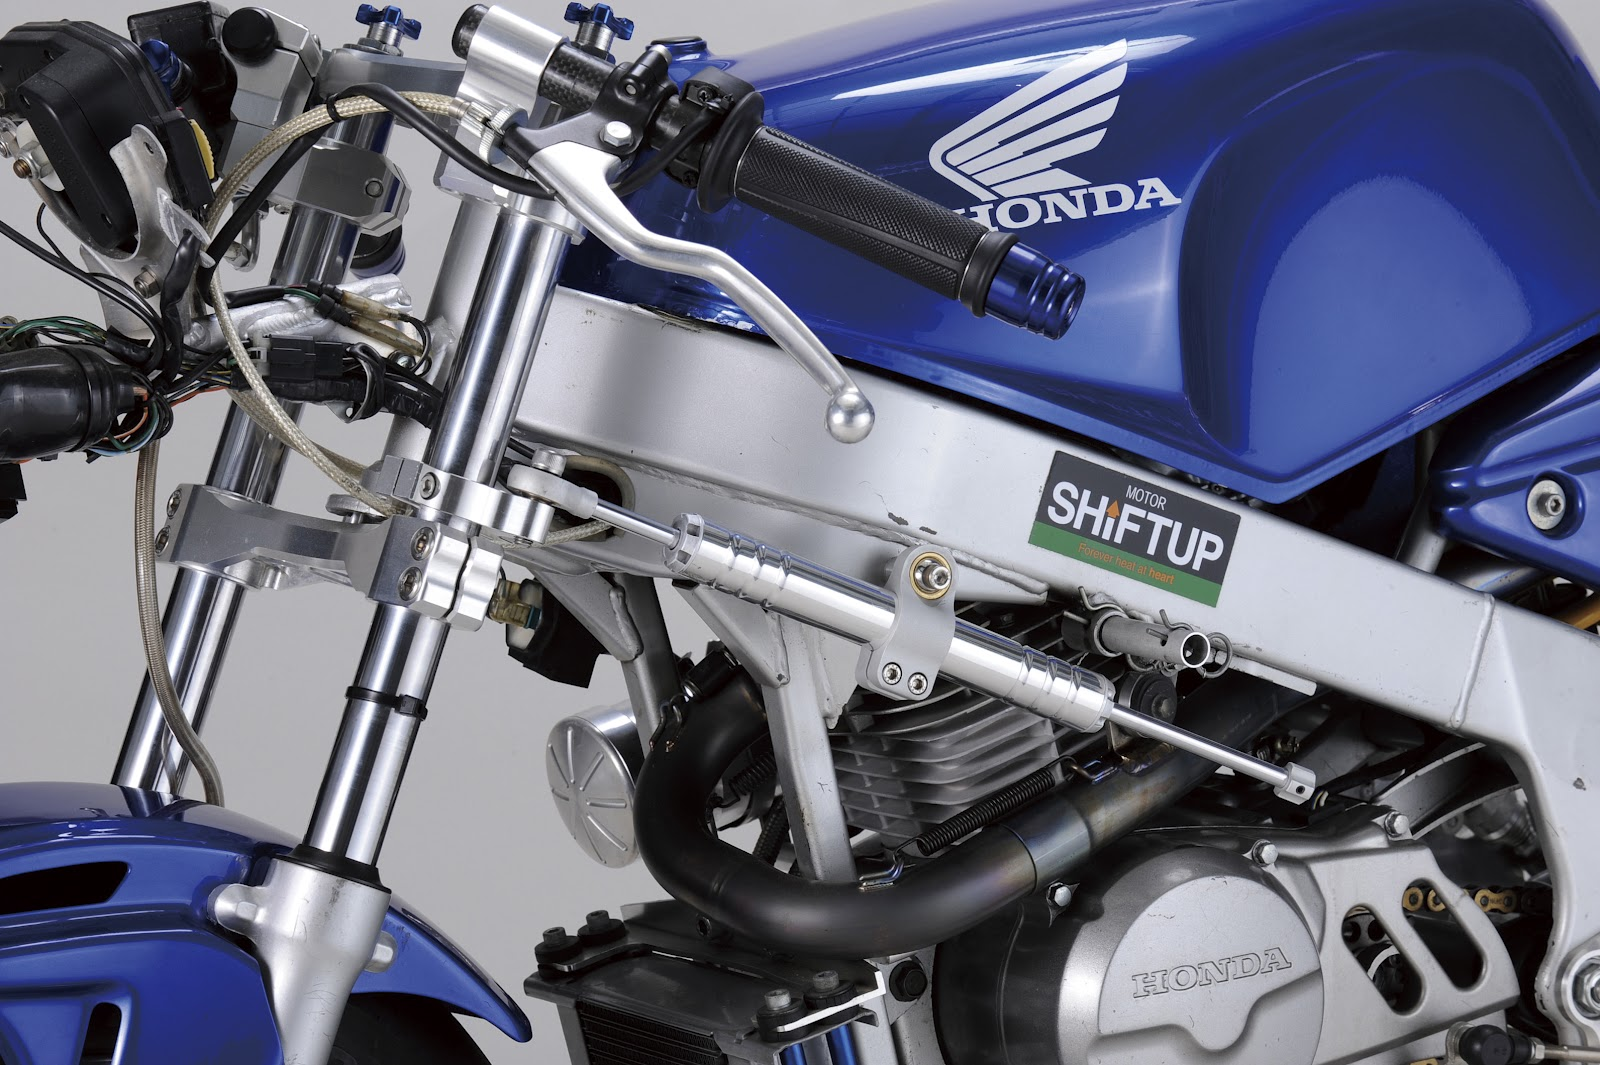 NSF-SDP001